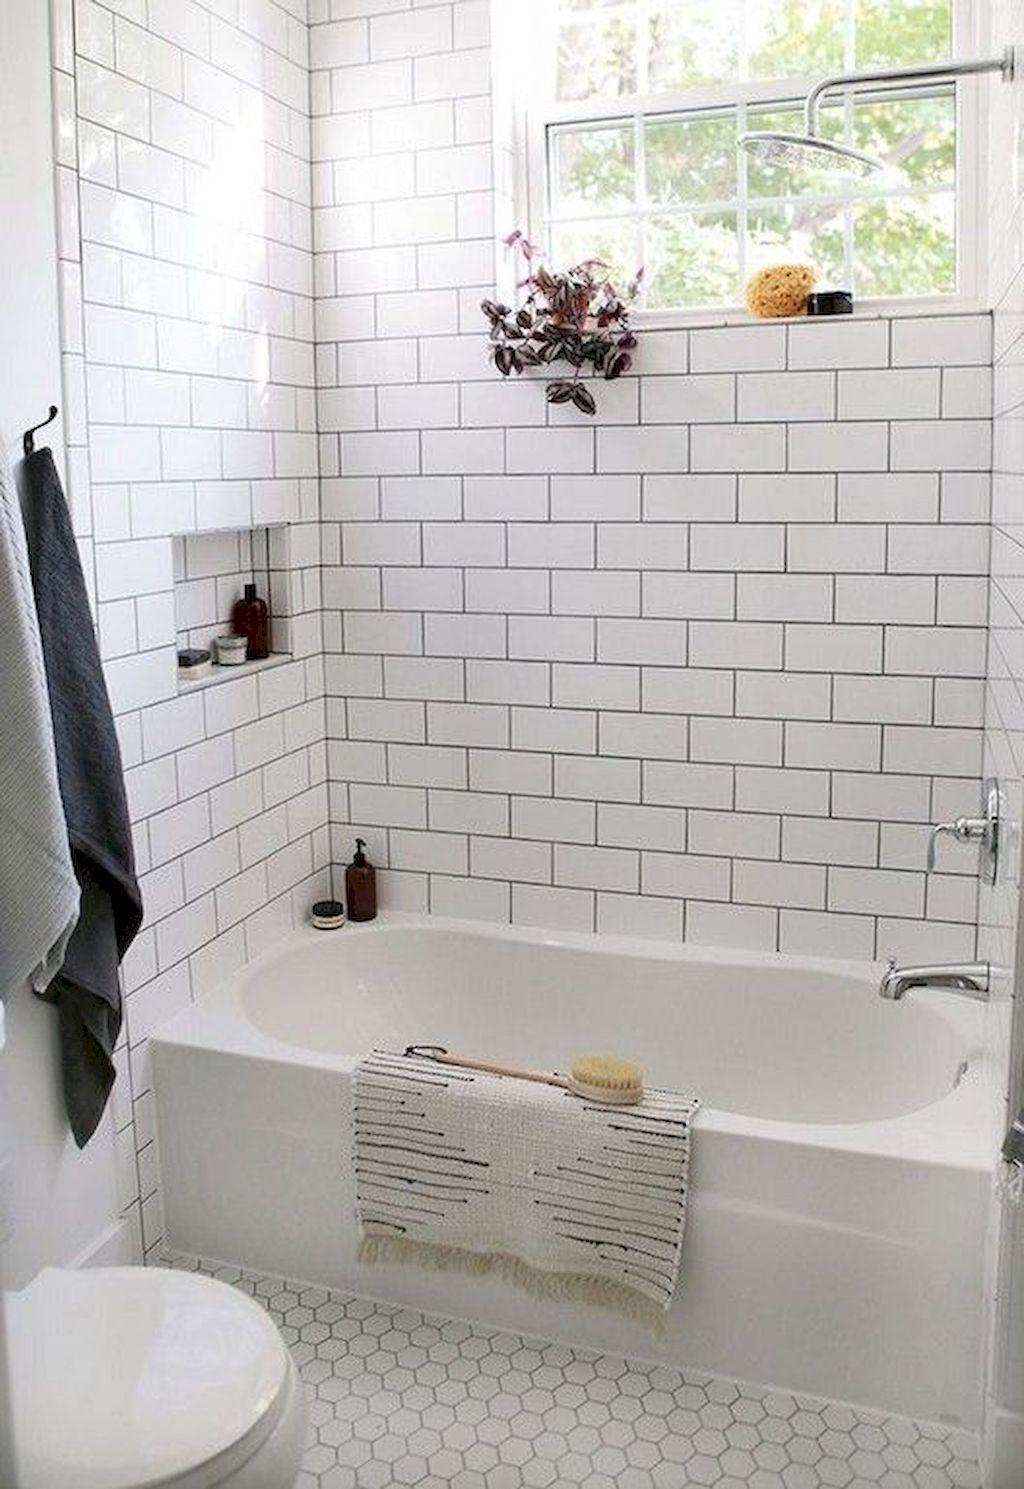 37 Cool Small Farmhouse Bathroom Remodel Design Ideas | House & Room ...